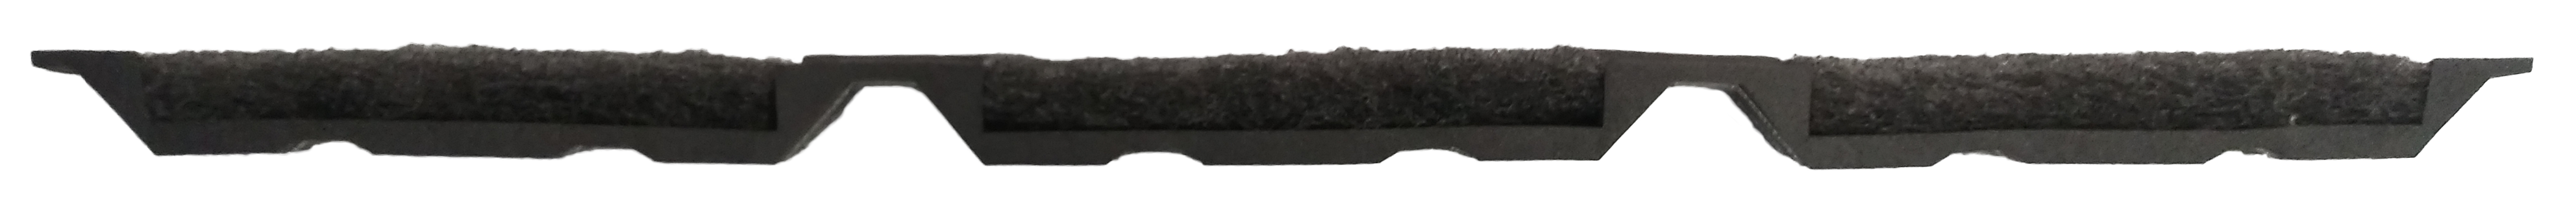 PBRCLV - PBR-1236 VENTED CLOSURE